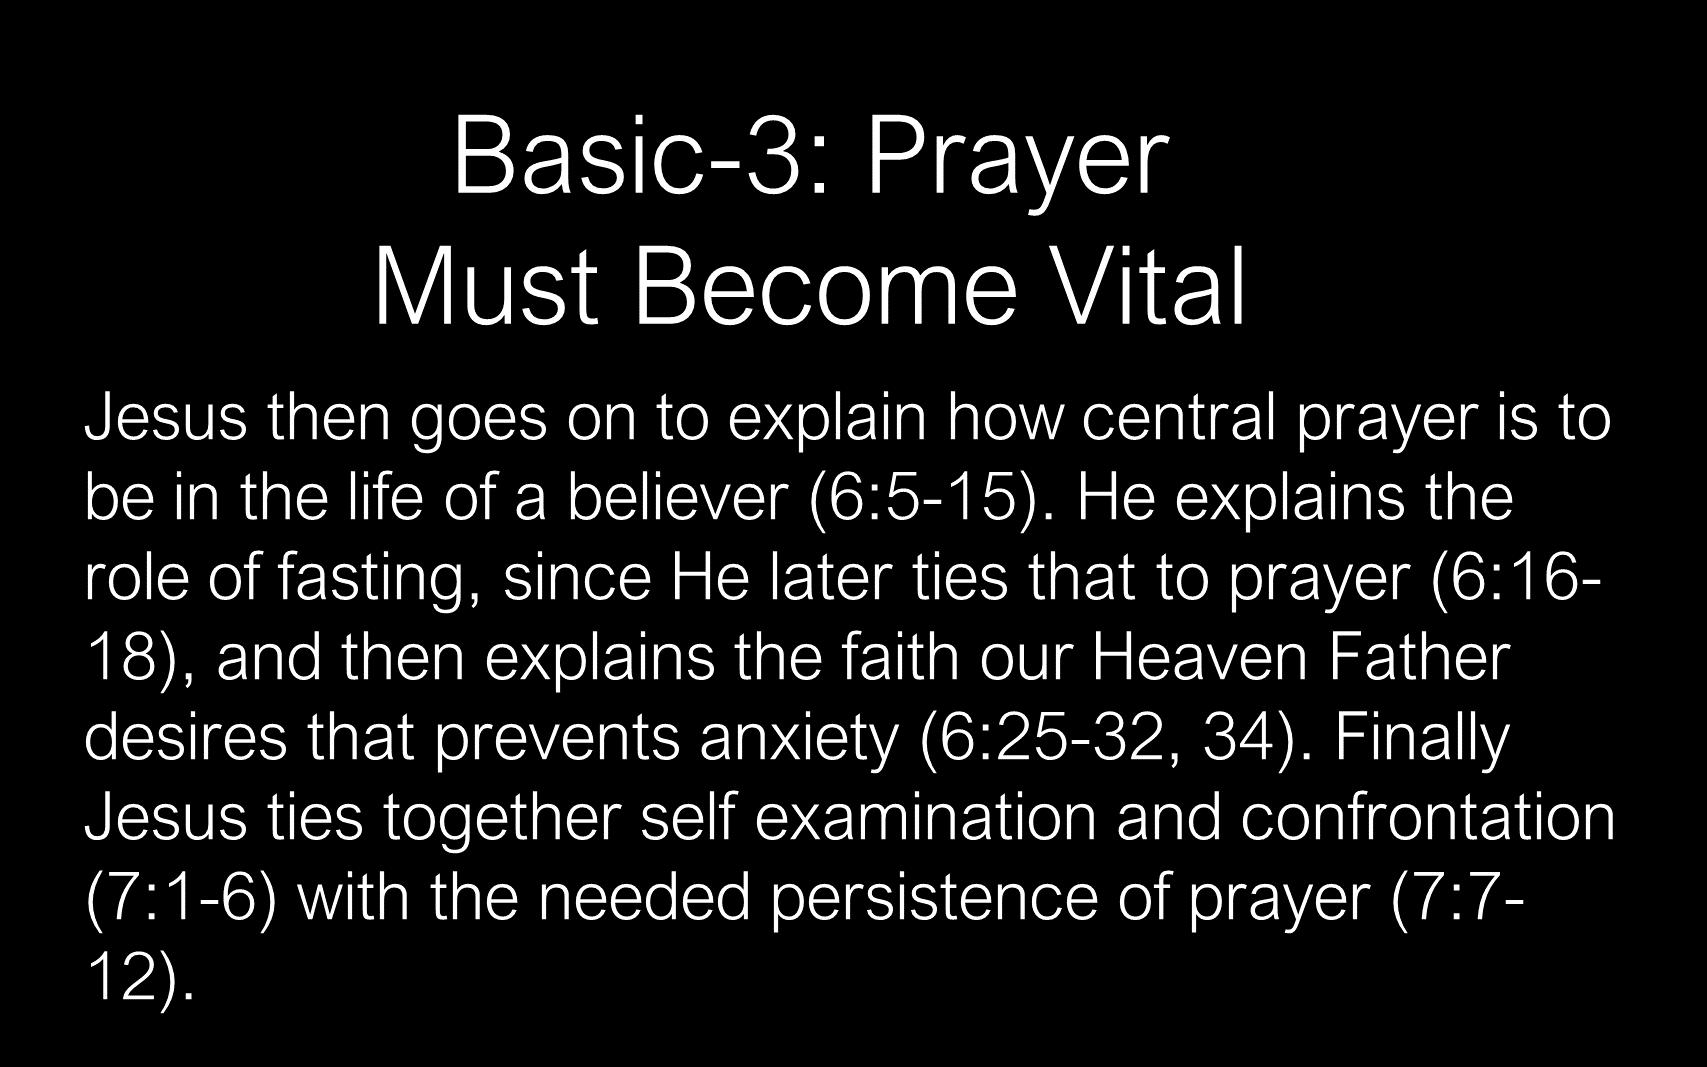 ESH-11 - The Discipline Of Disciple-Making - Disciples - Follow Christ & Make Disciples (17)